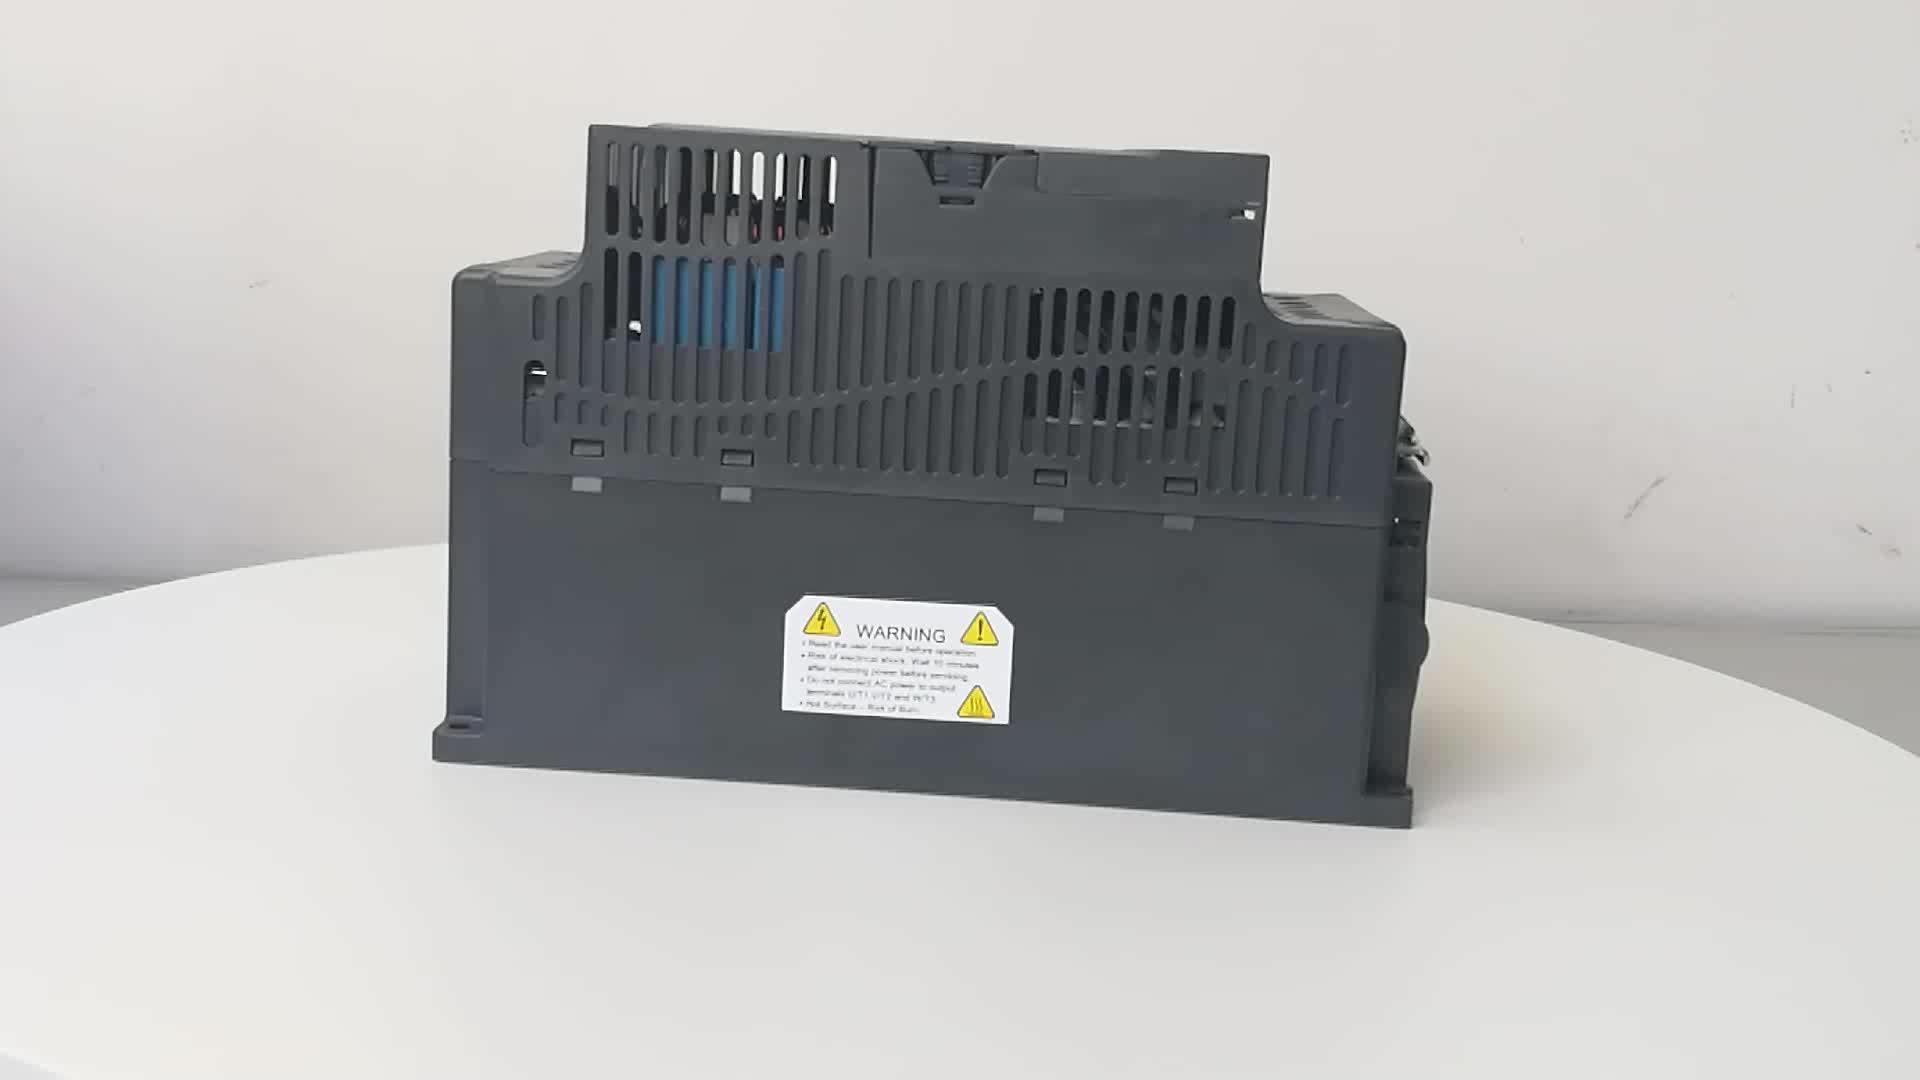 vfd ac motor drive 3hp 3 phase 380v 2.2kw inverter Delta frequency inverter ac motor speed controller